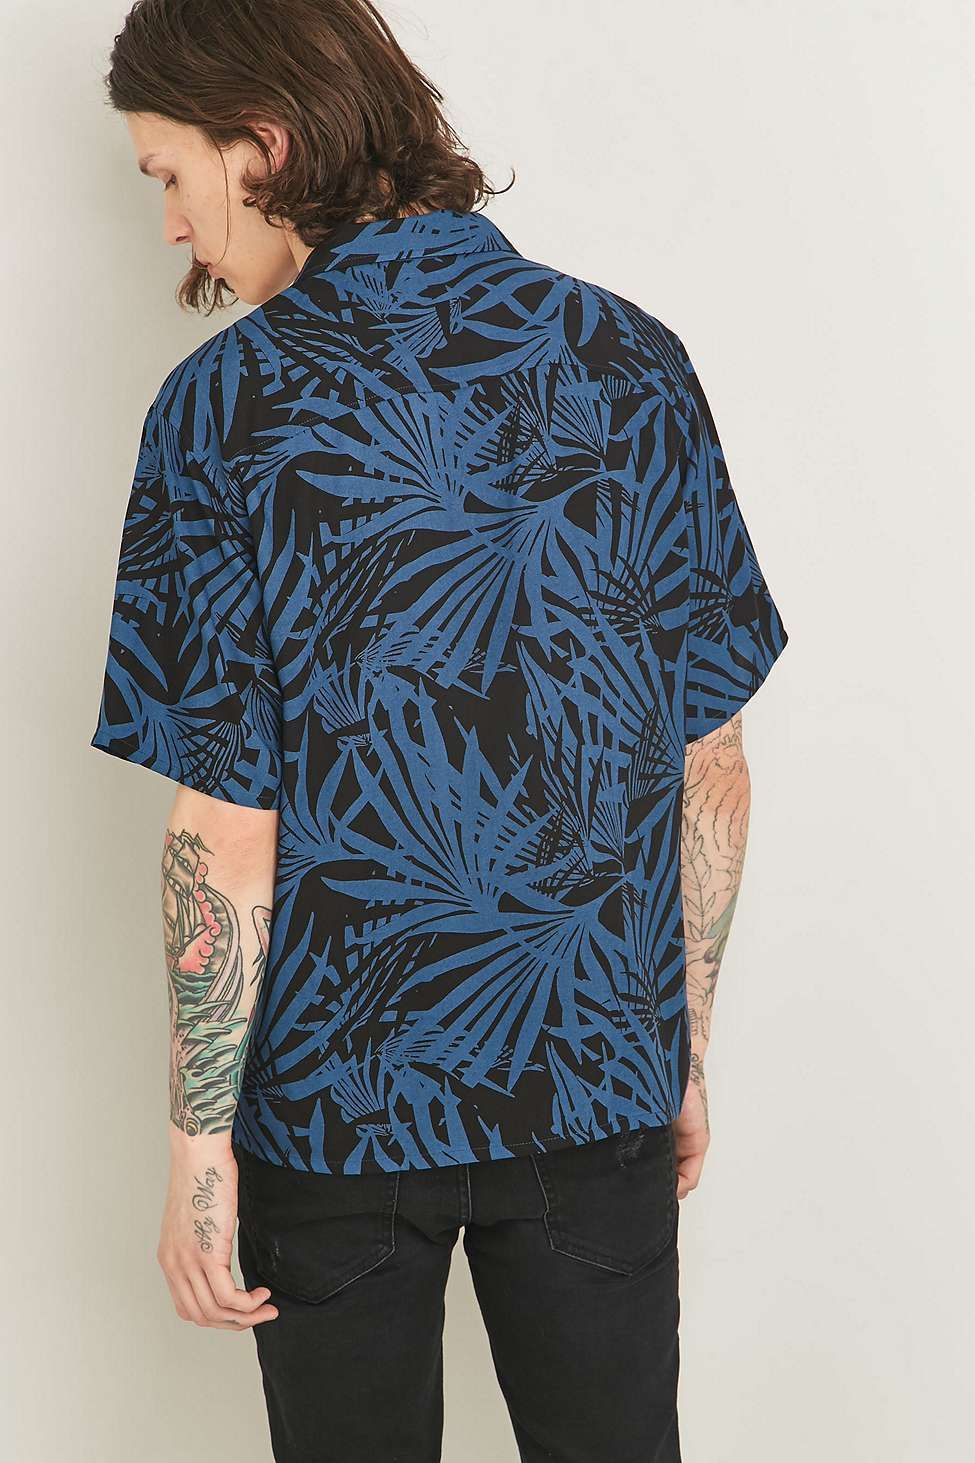 e7e7fb1b Loom Palm Blue Short Sleeve Shirt - Urban Outfitters | > BLUE ...